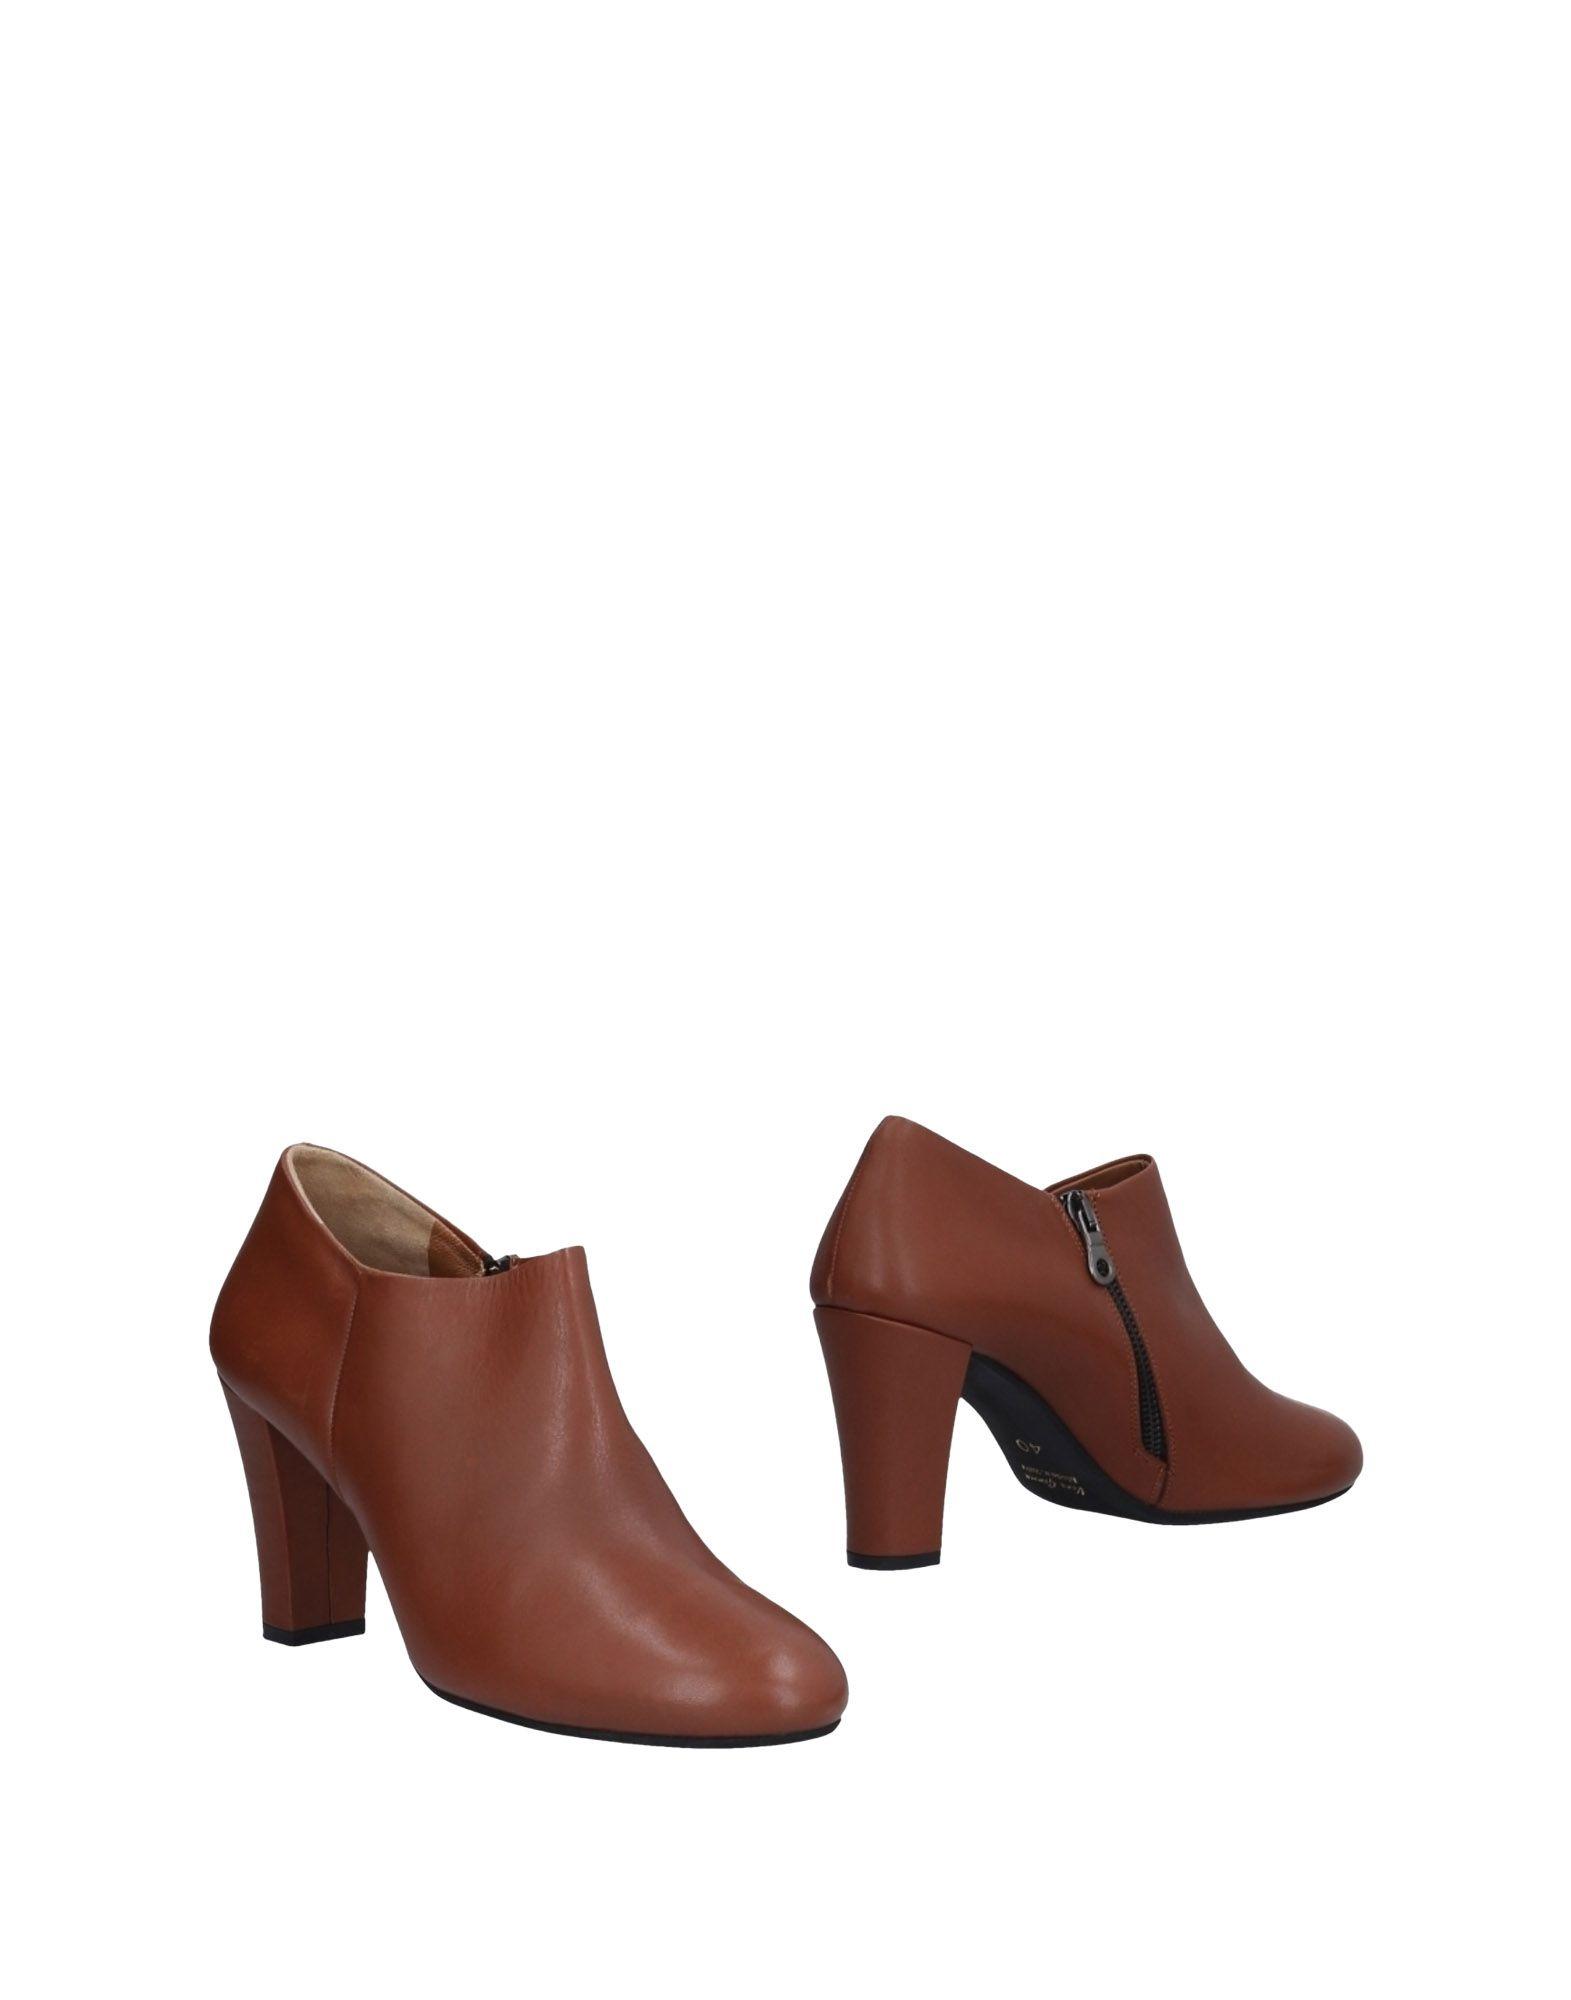 Manifattura National Ankle Boot - Boots Women Manifattura National Ankle Boots - online on  Australia - 11474443OA 8405dc